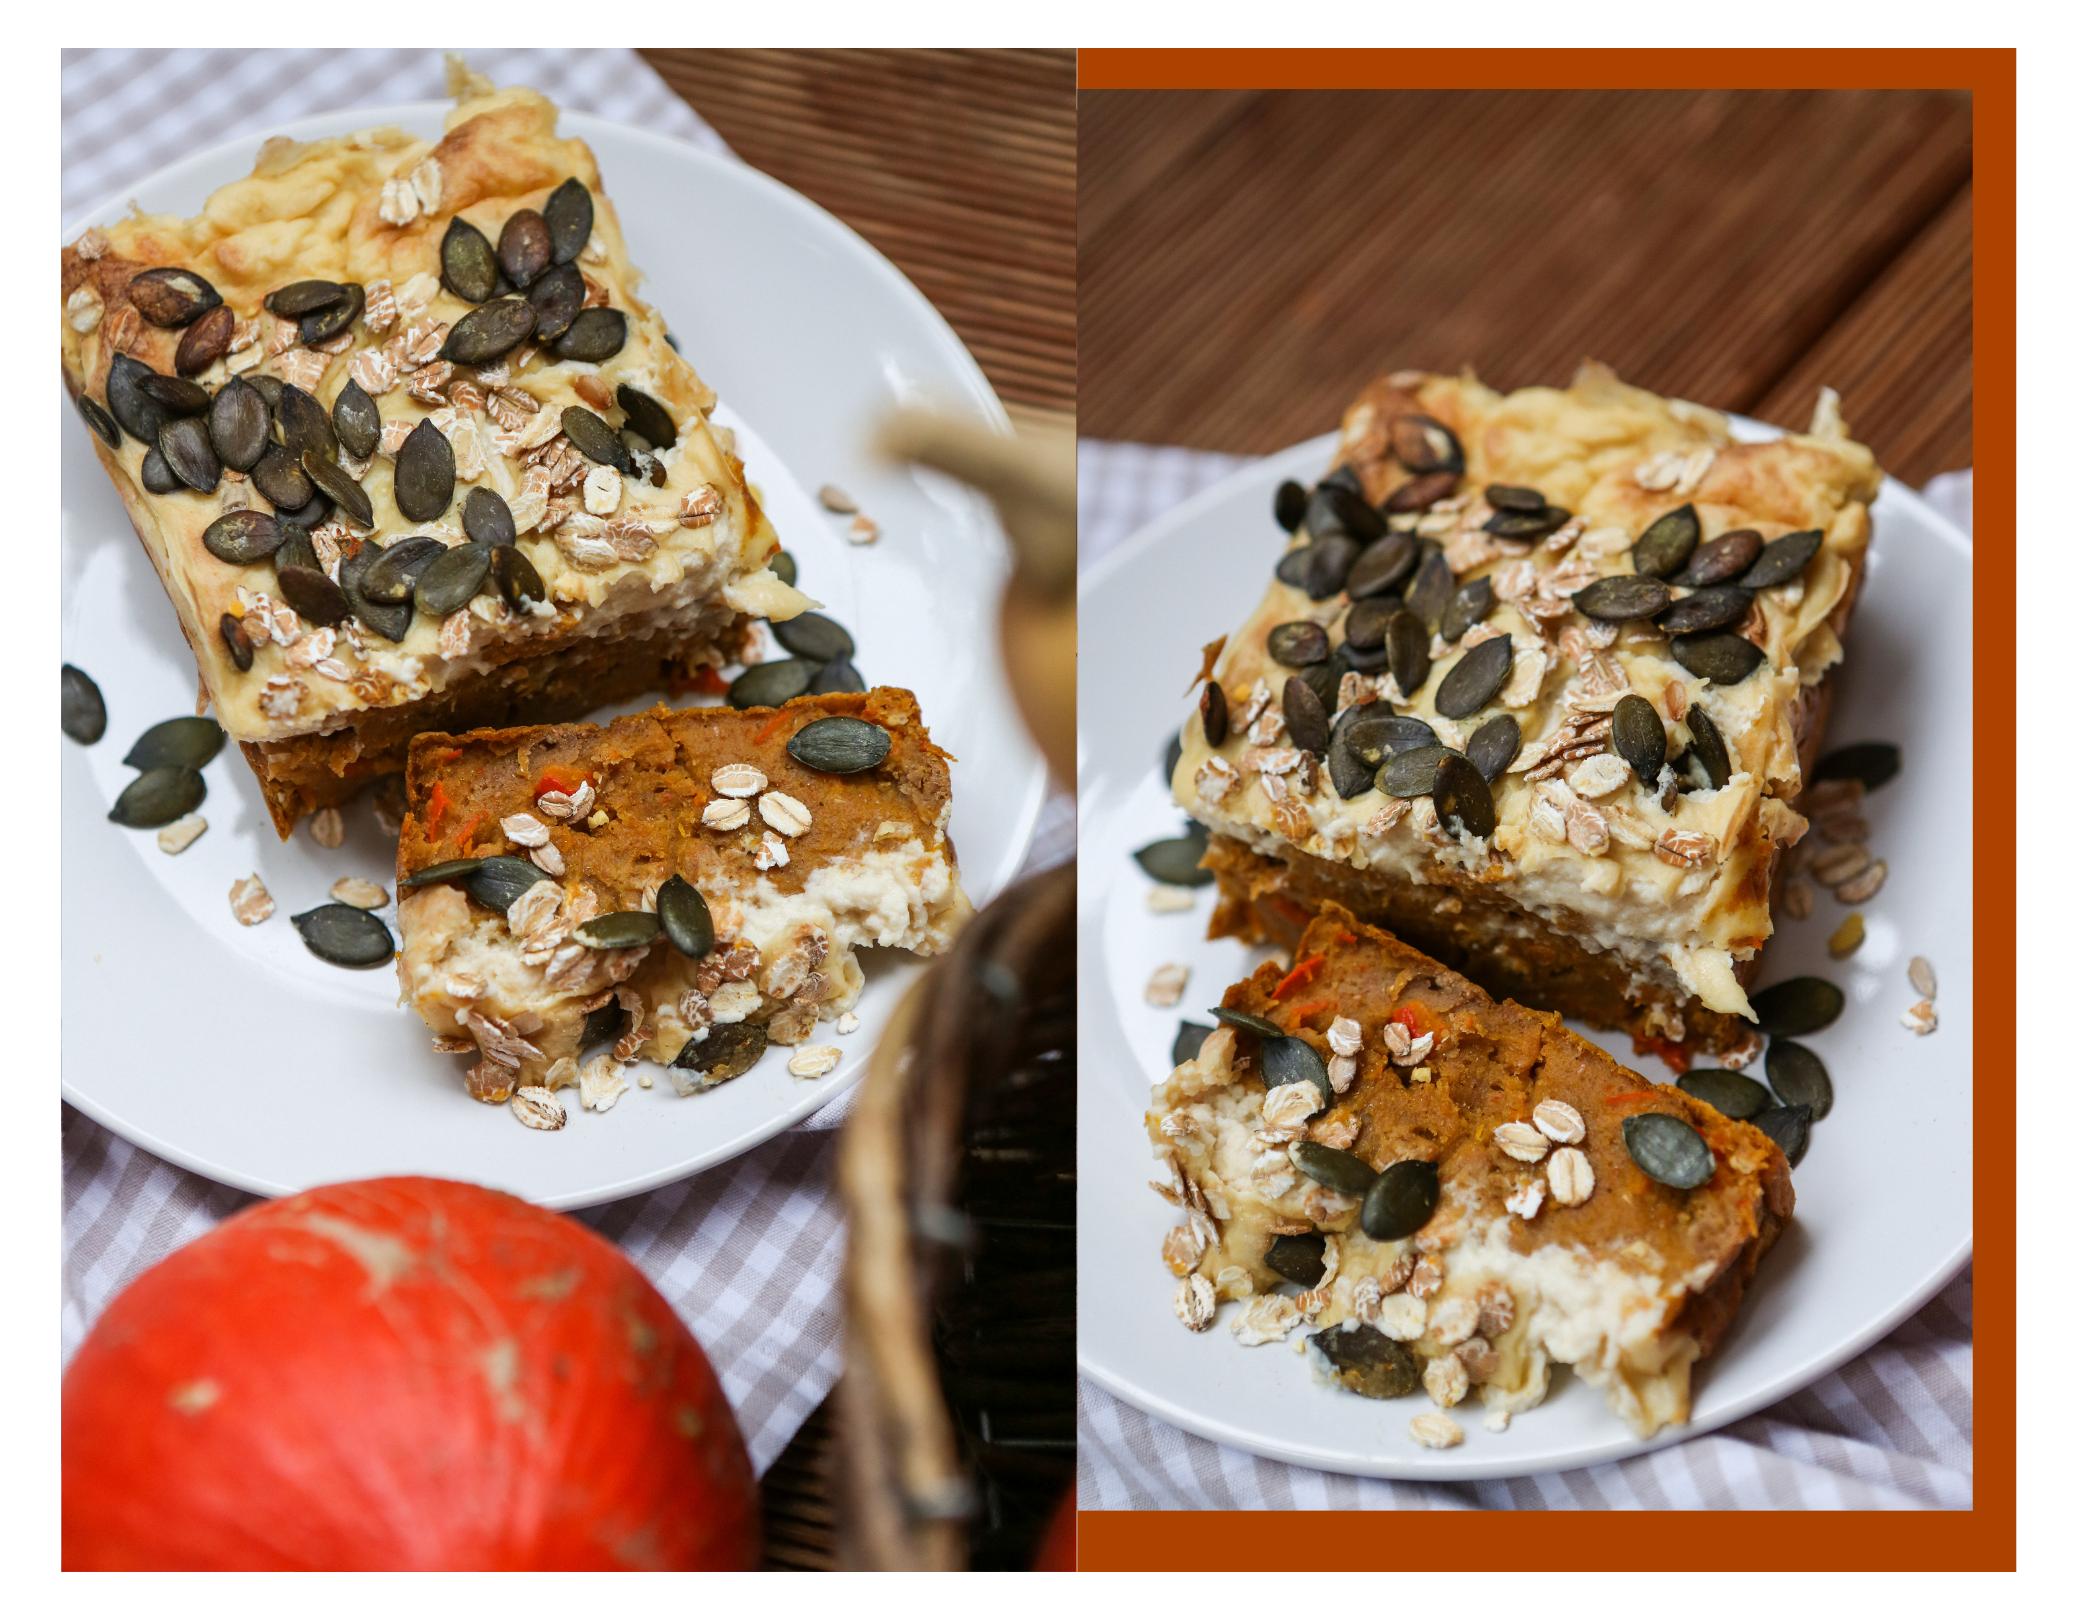 lauralamode-pumpkin-cheesecake-kürbis-kürbiskuchen-vegan-protein-vegan protein cake-vegan pumpkin cake-vegan recipes-foodblogger